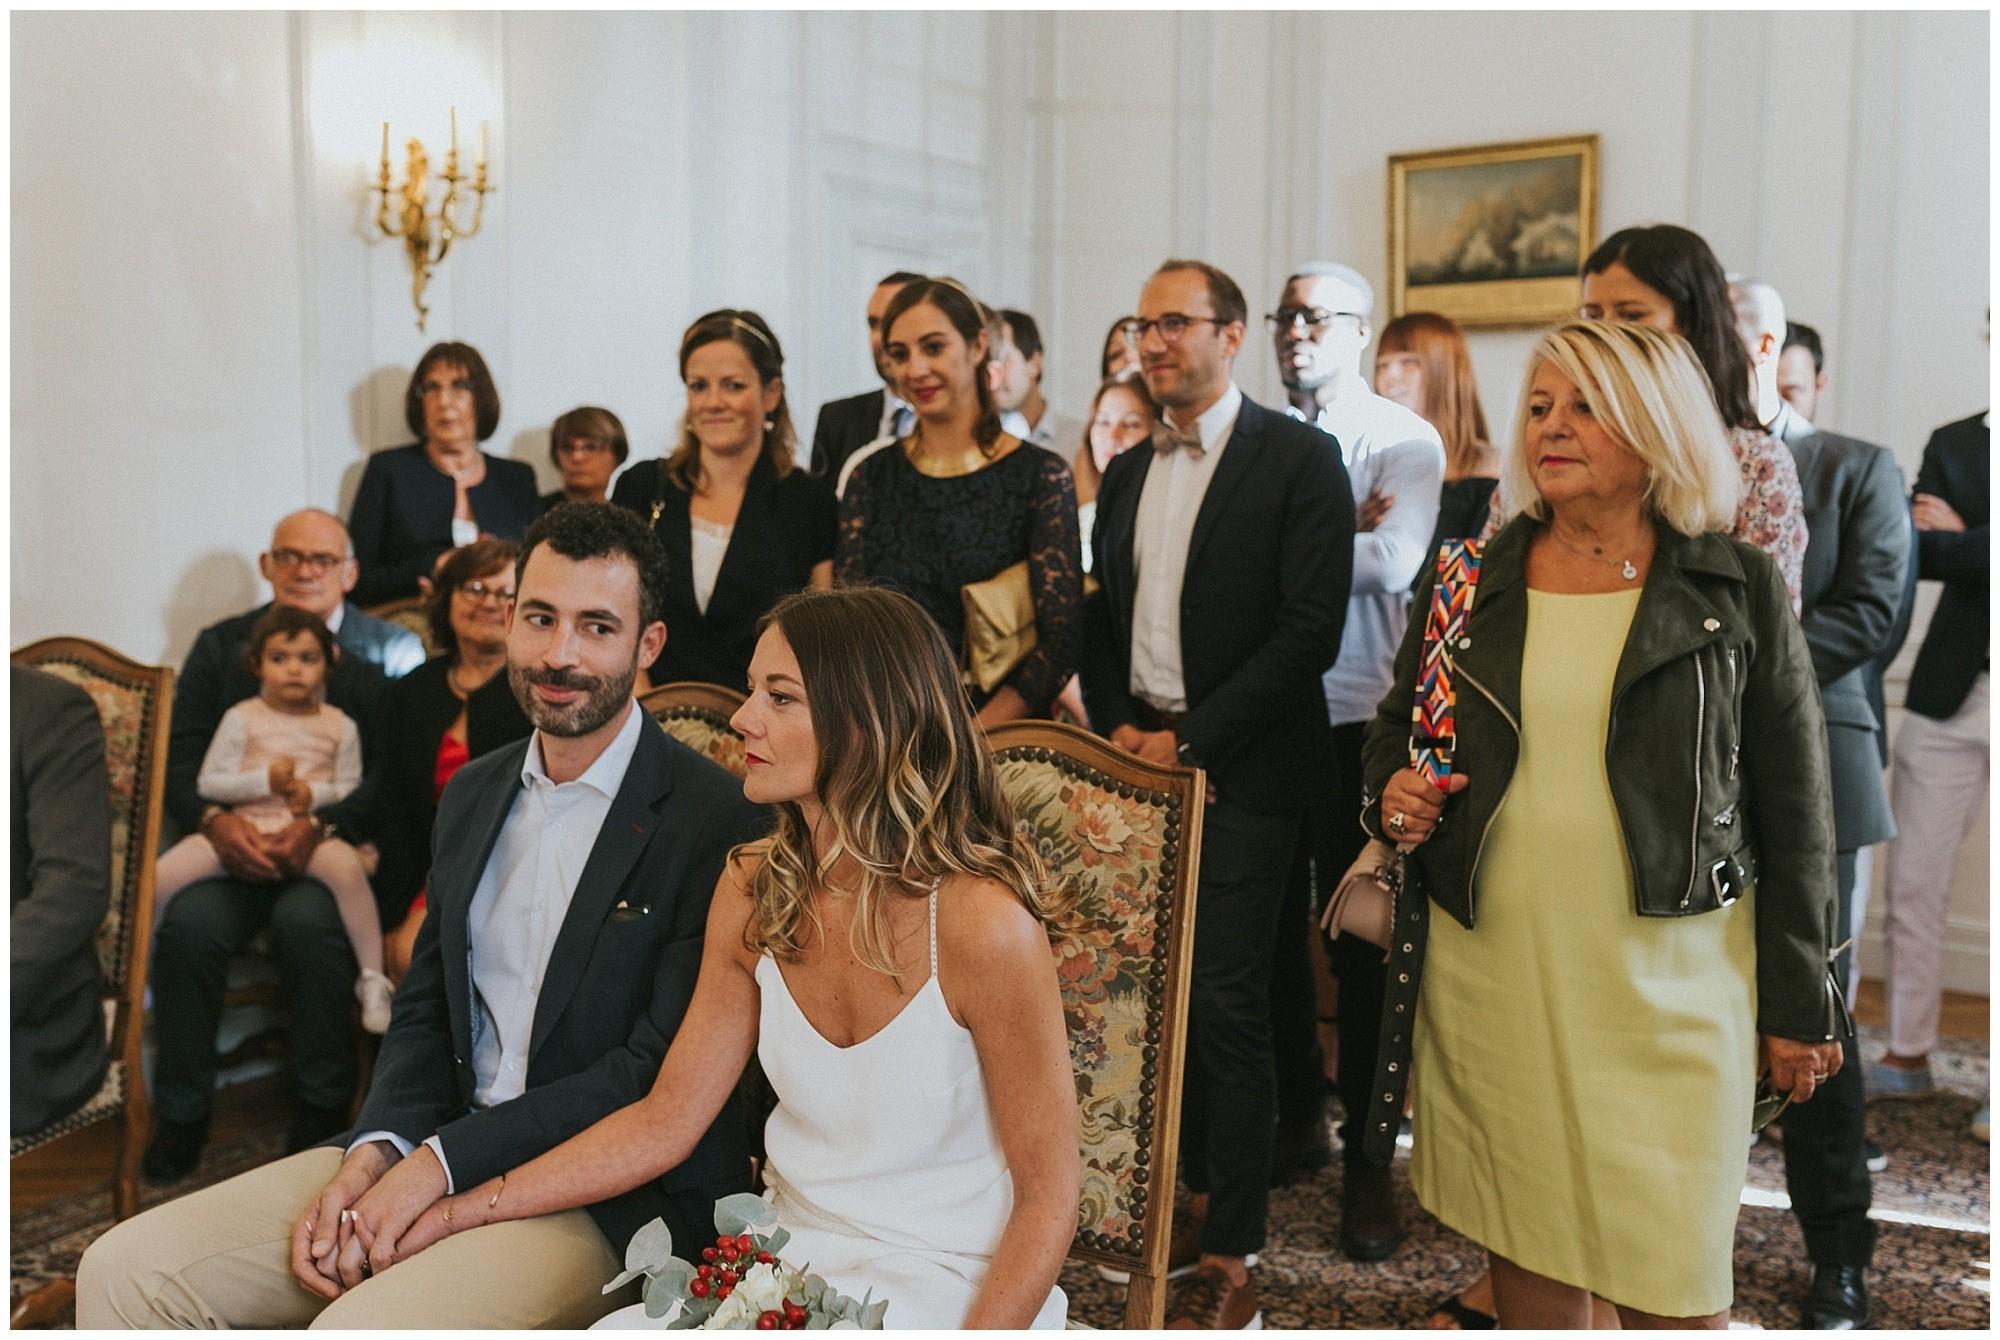 Kateryna-photos-photographe-mariage-bretagne-saint-malo-finistere-cotes-darmor-wedding_0055.jpg